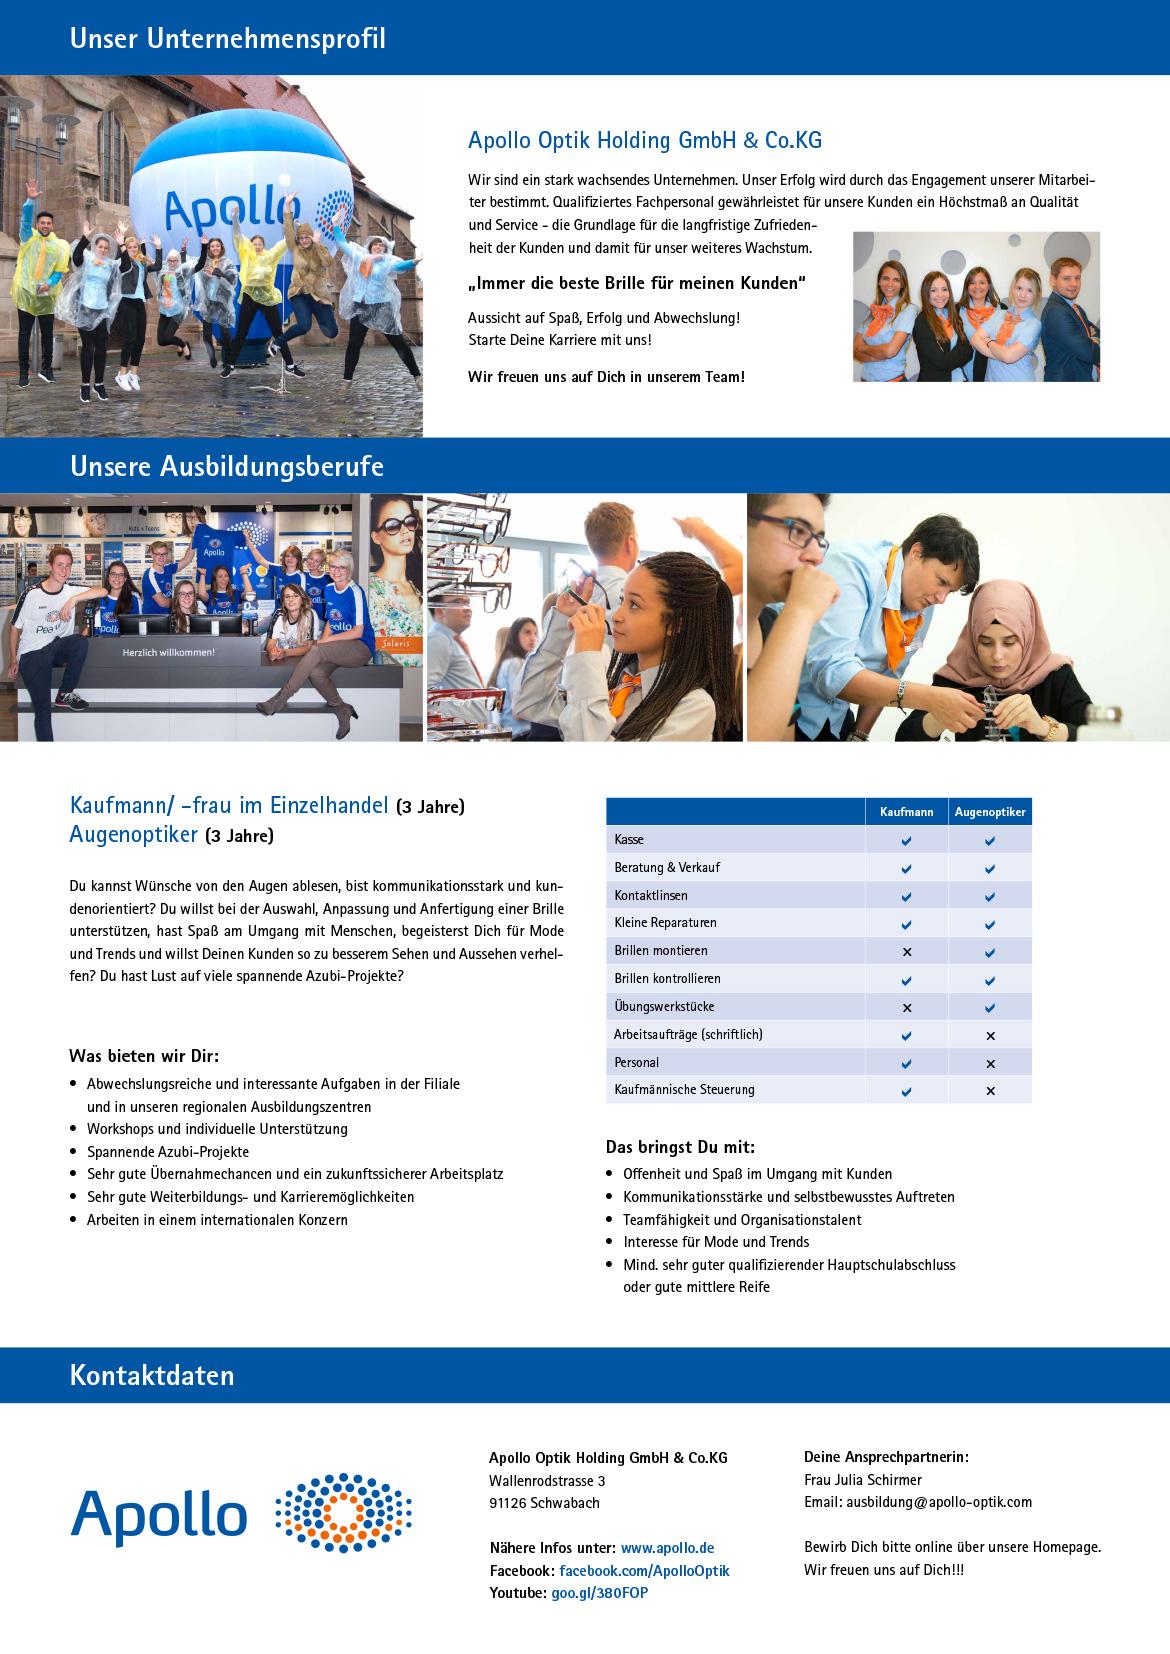 Ausbildungsplakat: Apollo Optik Holding GmbH & Co.KG